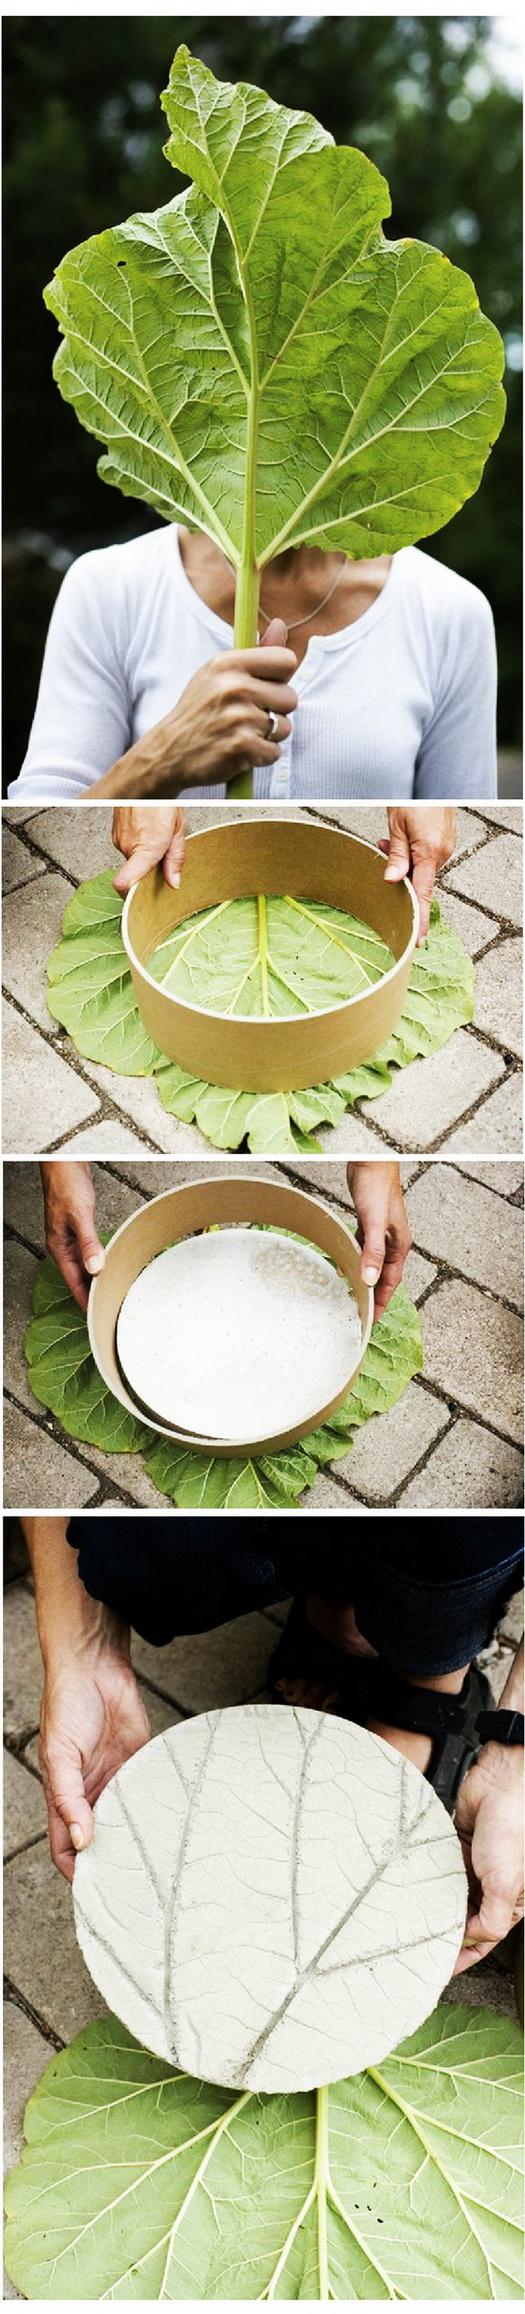 32-ideas-for-garden-decoration (2)